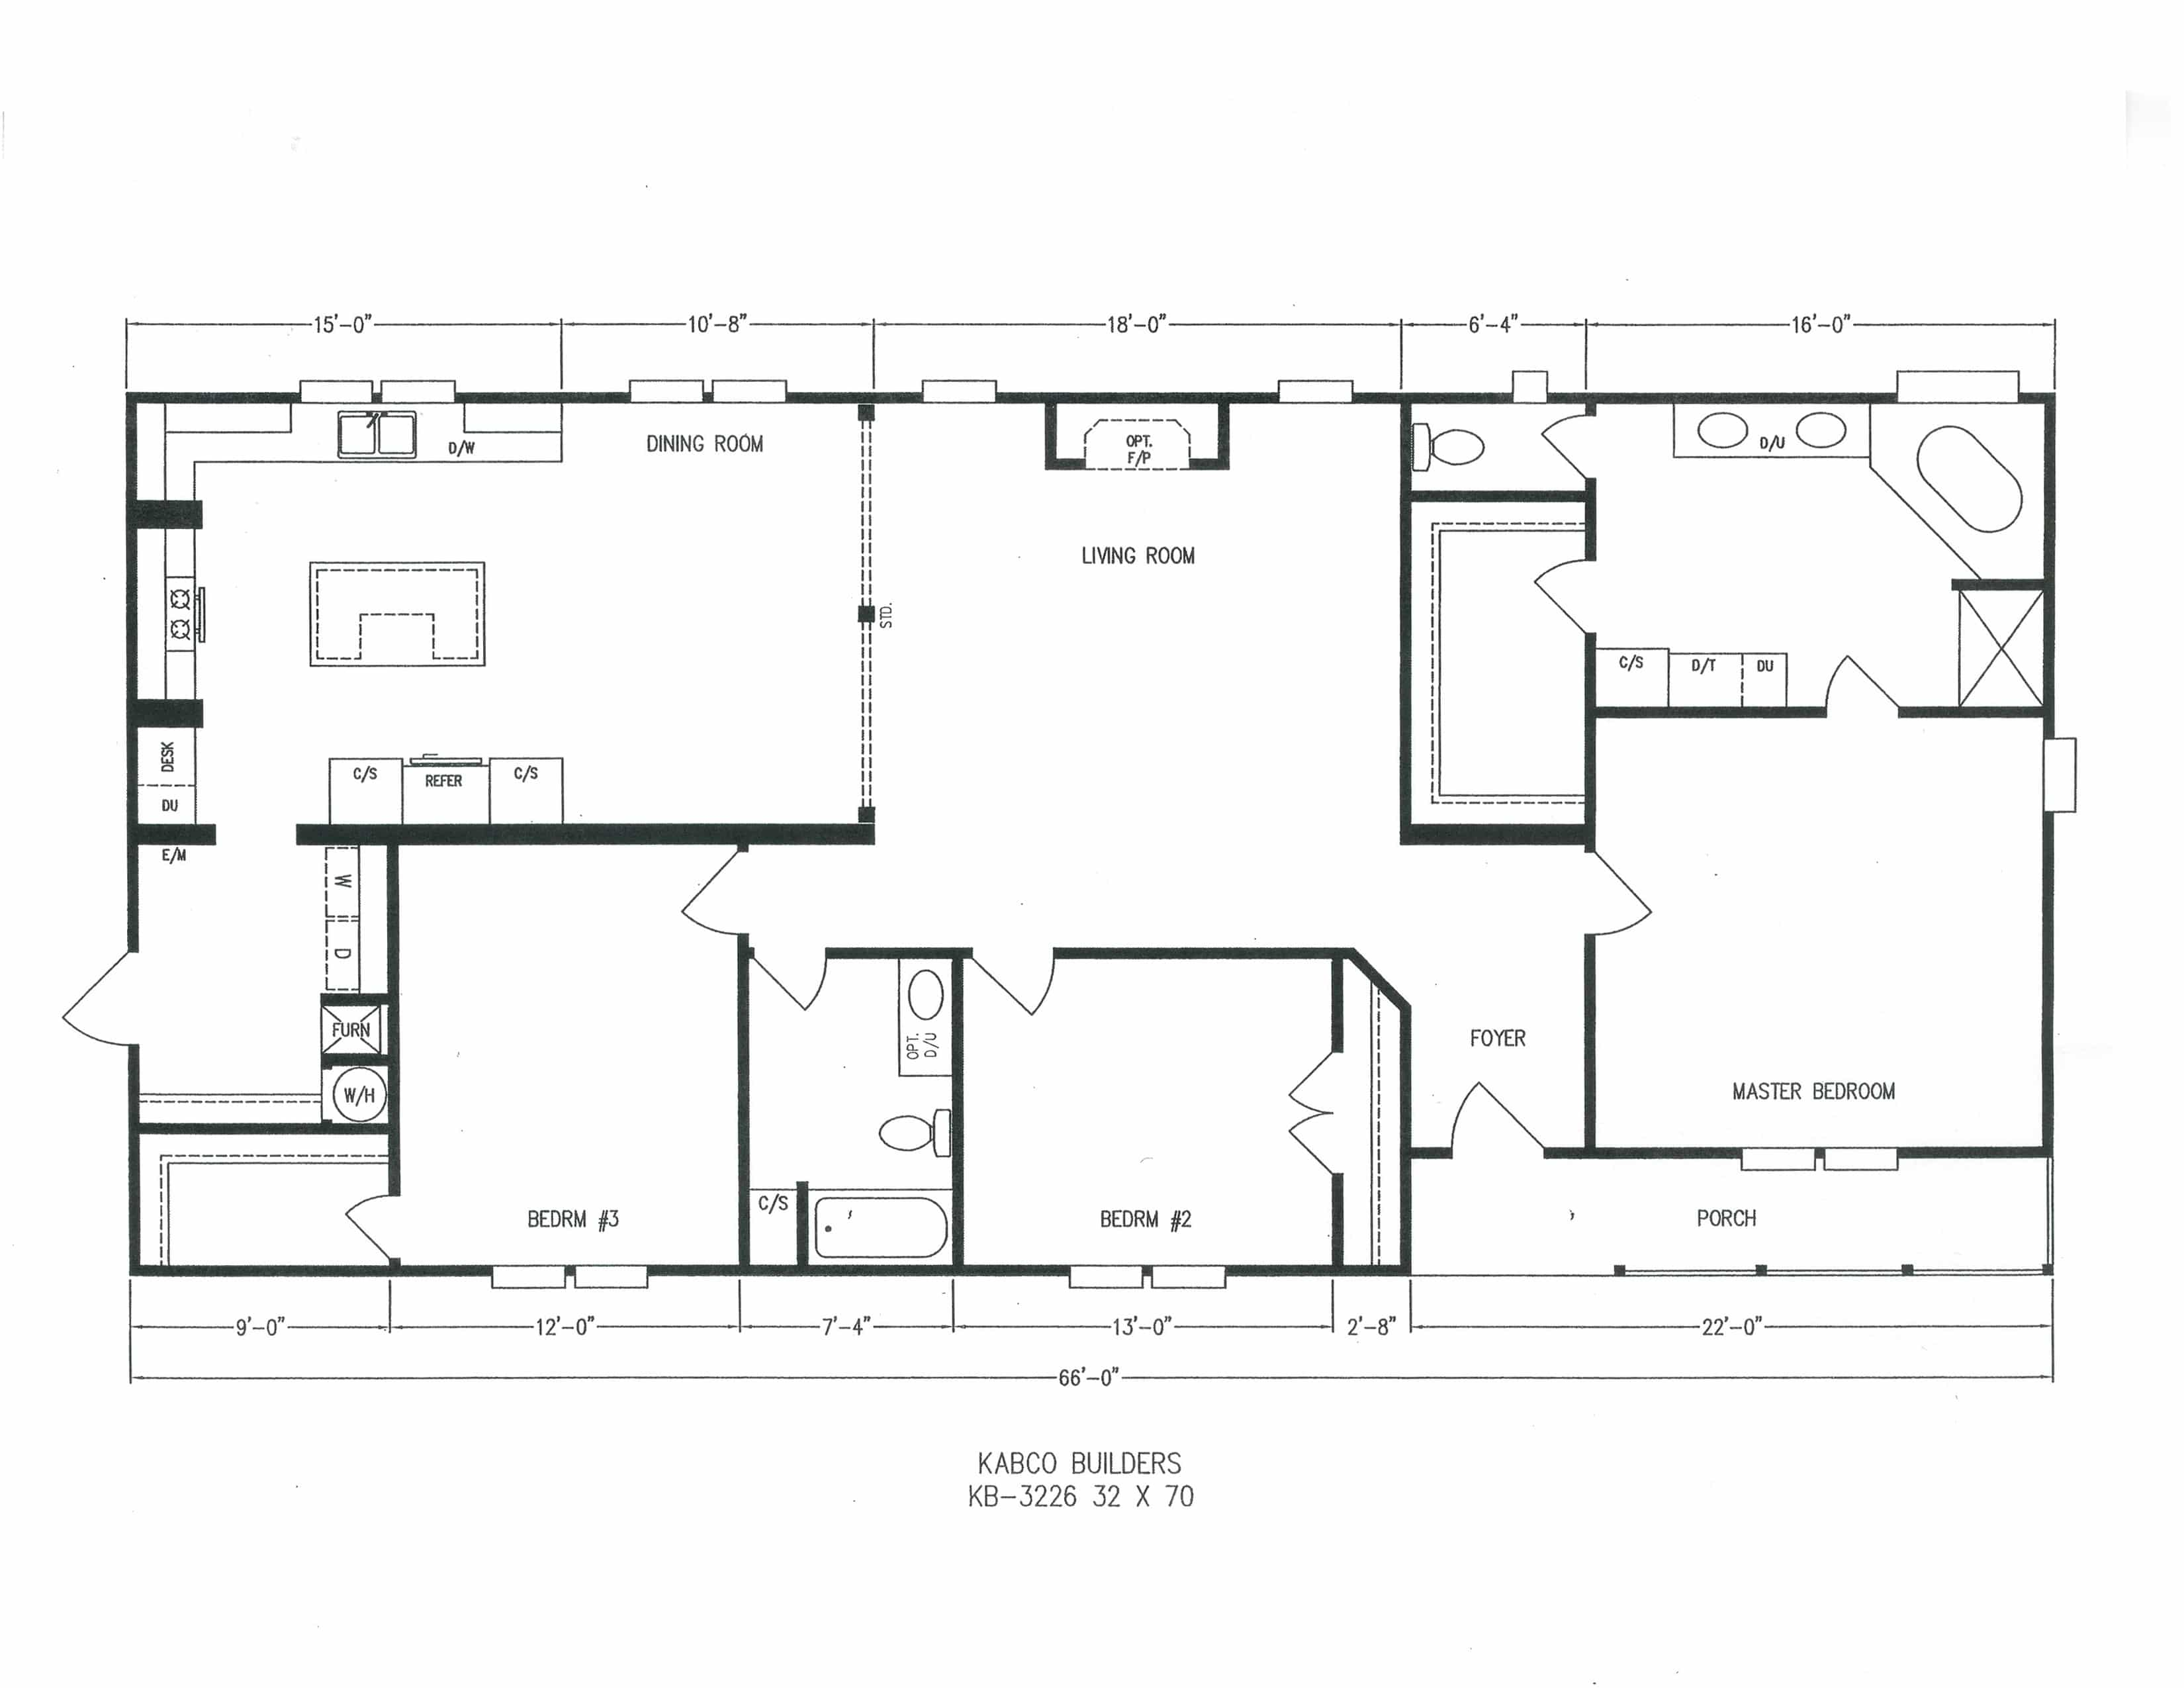 3 Bedroom Floor Plan K 3226 Hawks Homes Manufactured